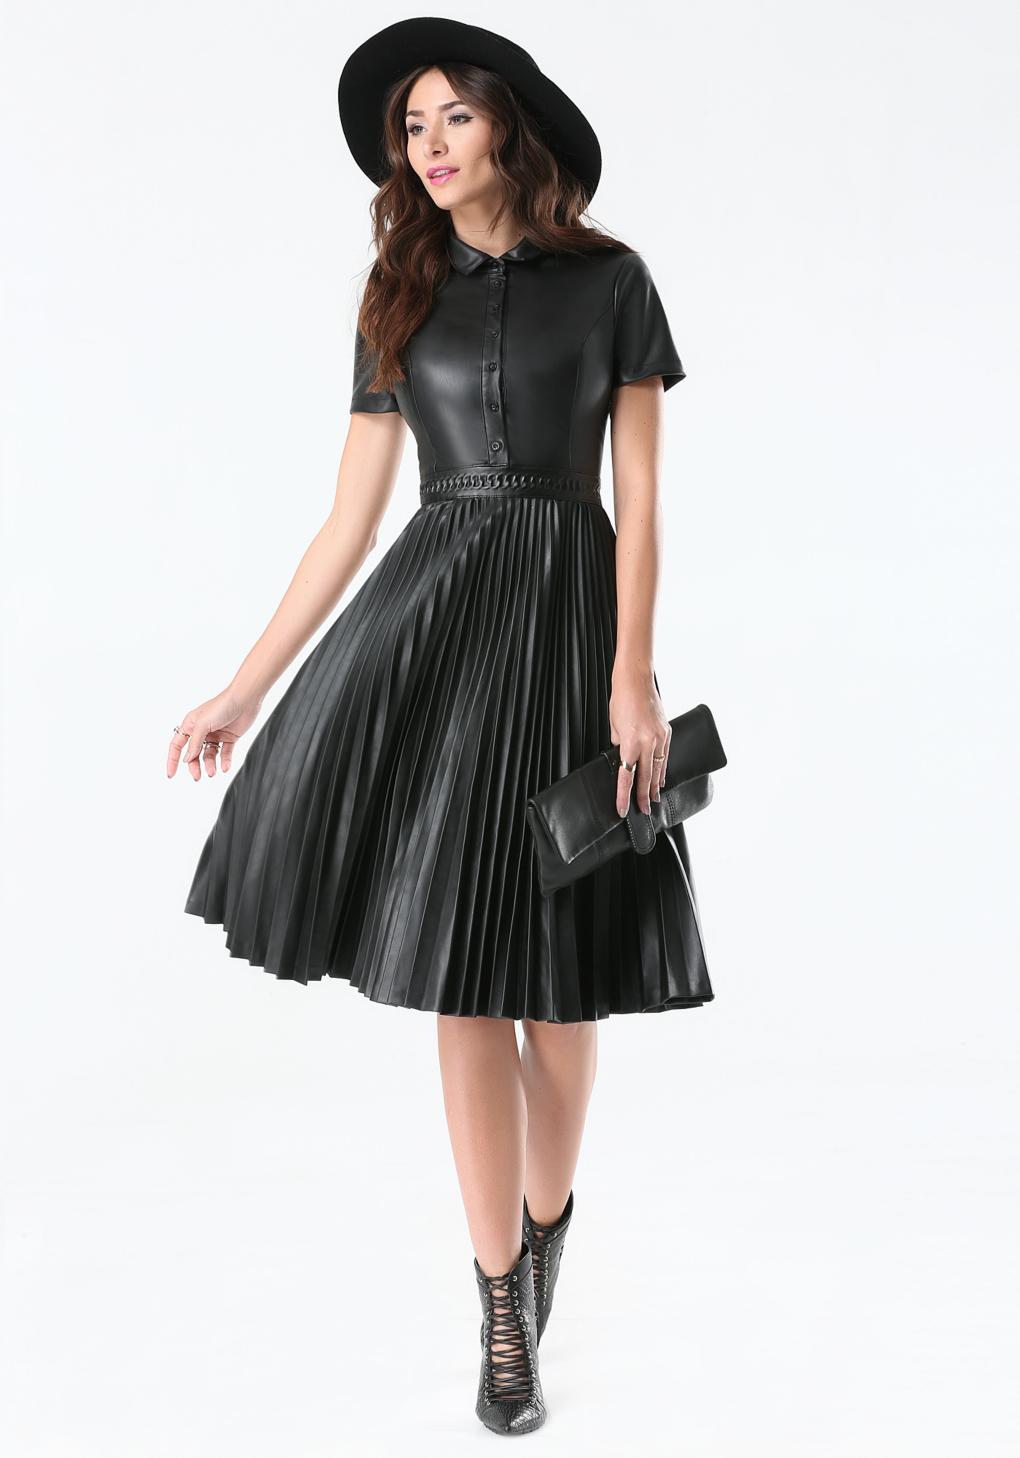 Bebe Faux Leather Pleated Dress in Black - Lyst